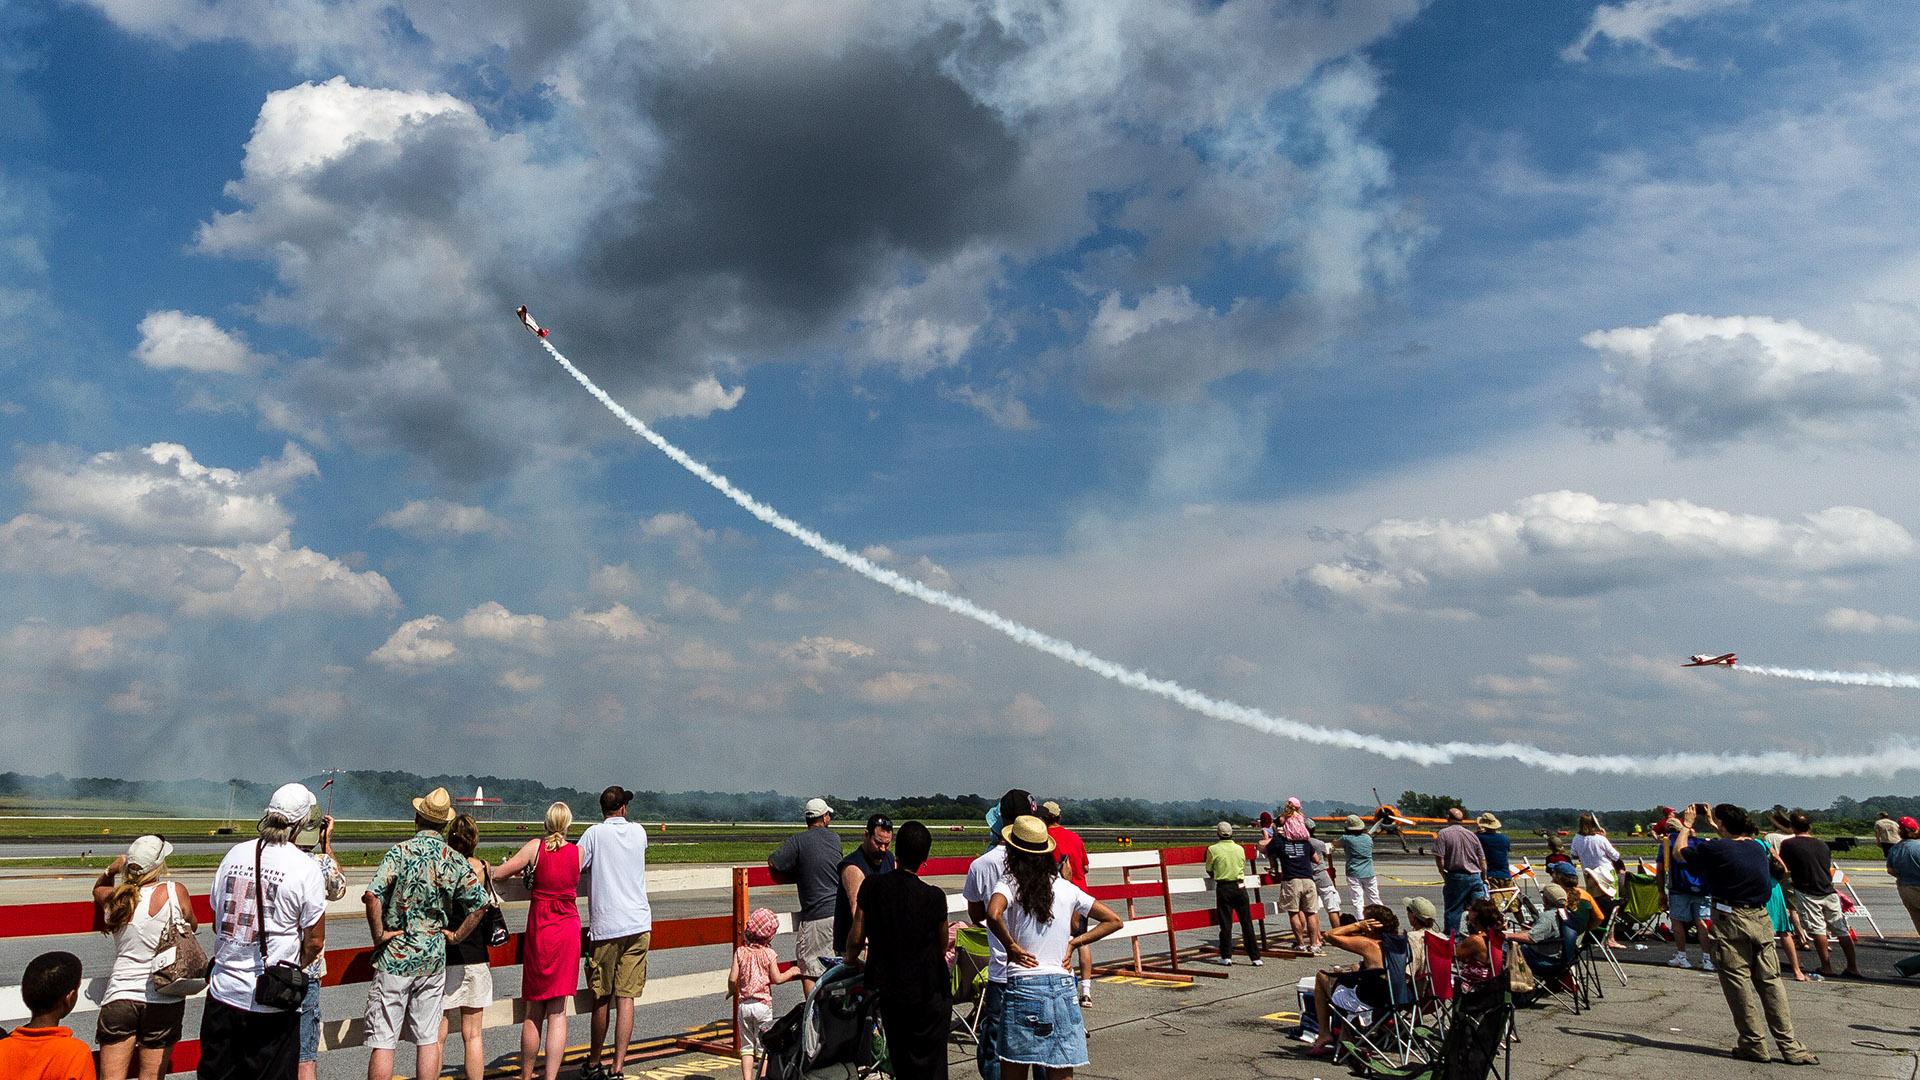 Spectators watch the Aeroshell airobatic team at Atlanta's Peachtree DeKalb airport. Photo by Kevin Ames